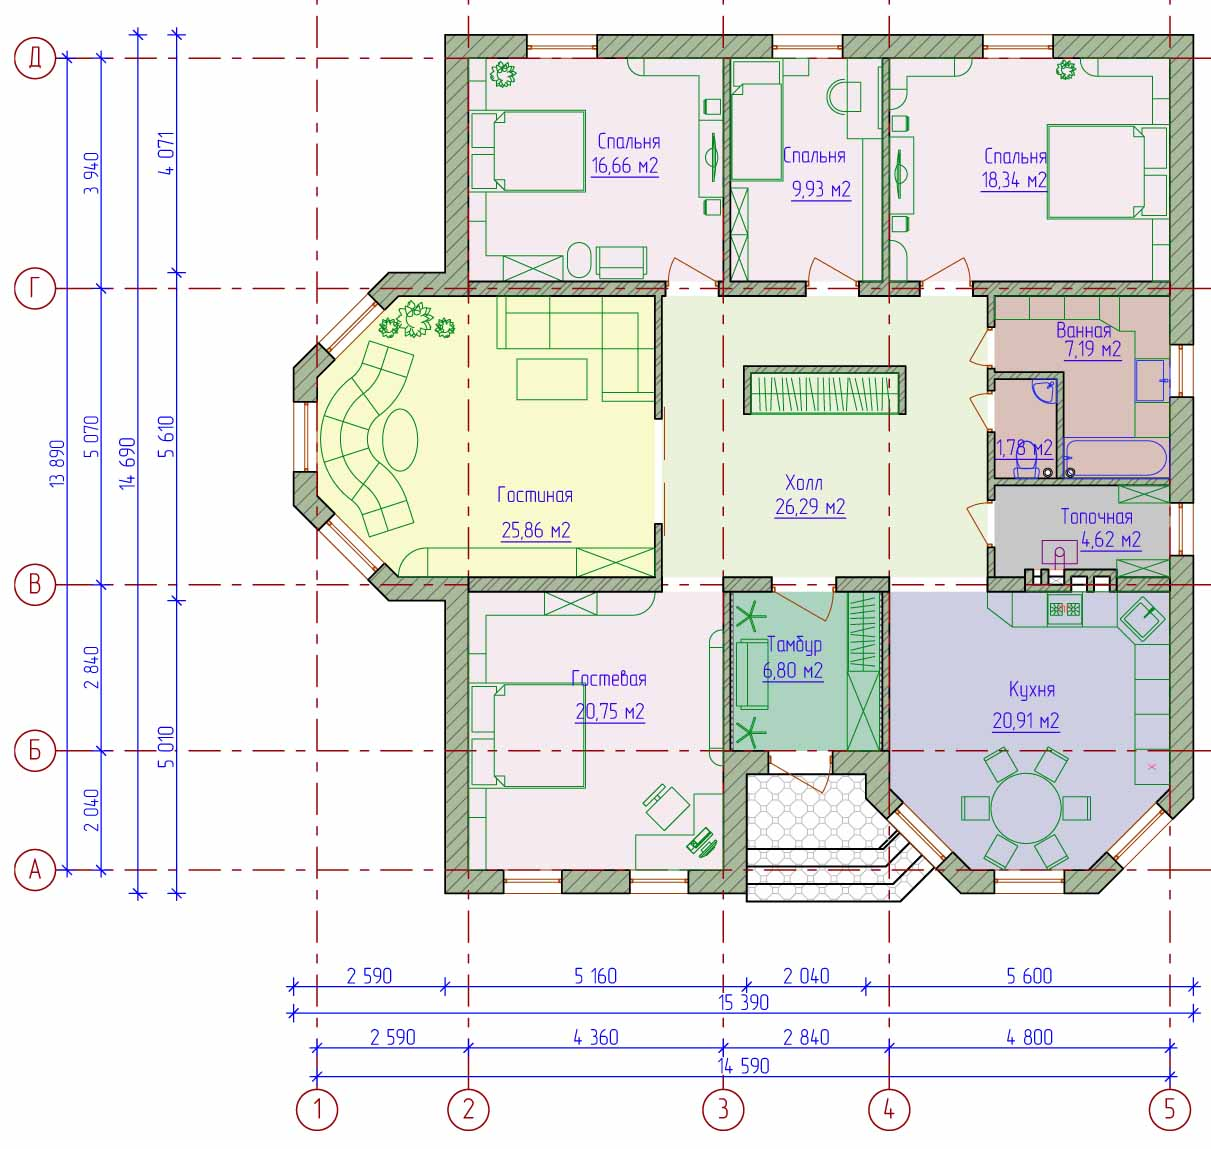 планировка дома онлайн бесплатно